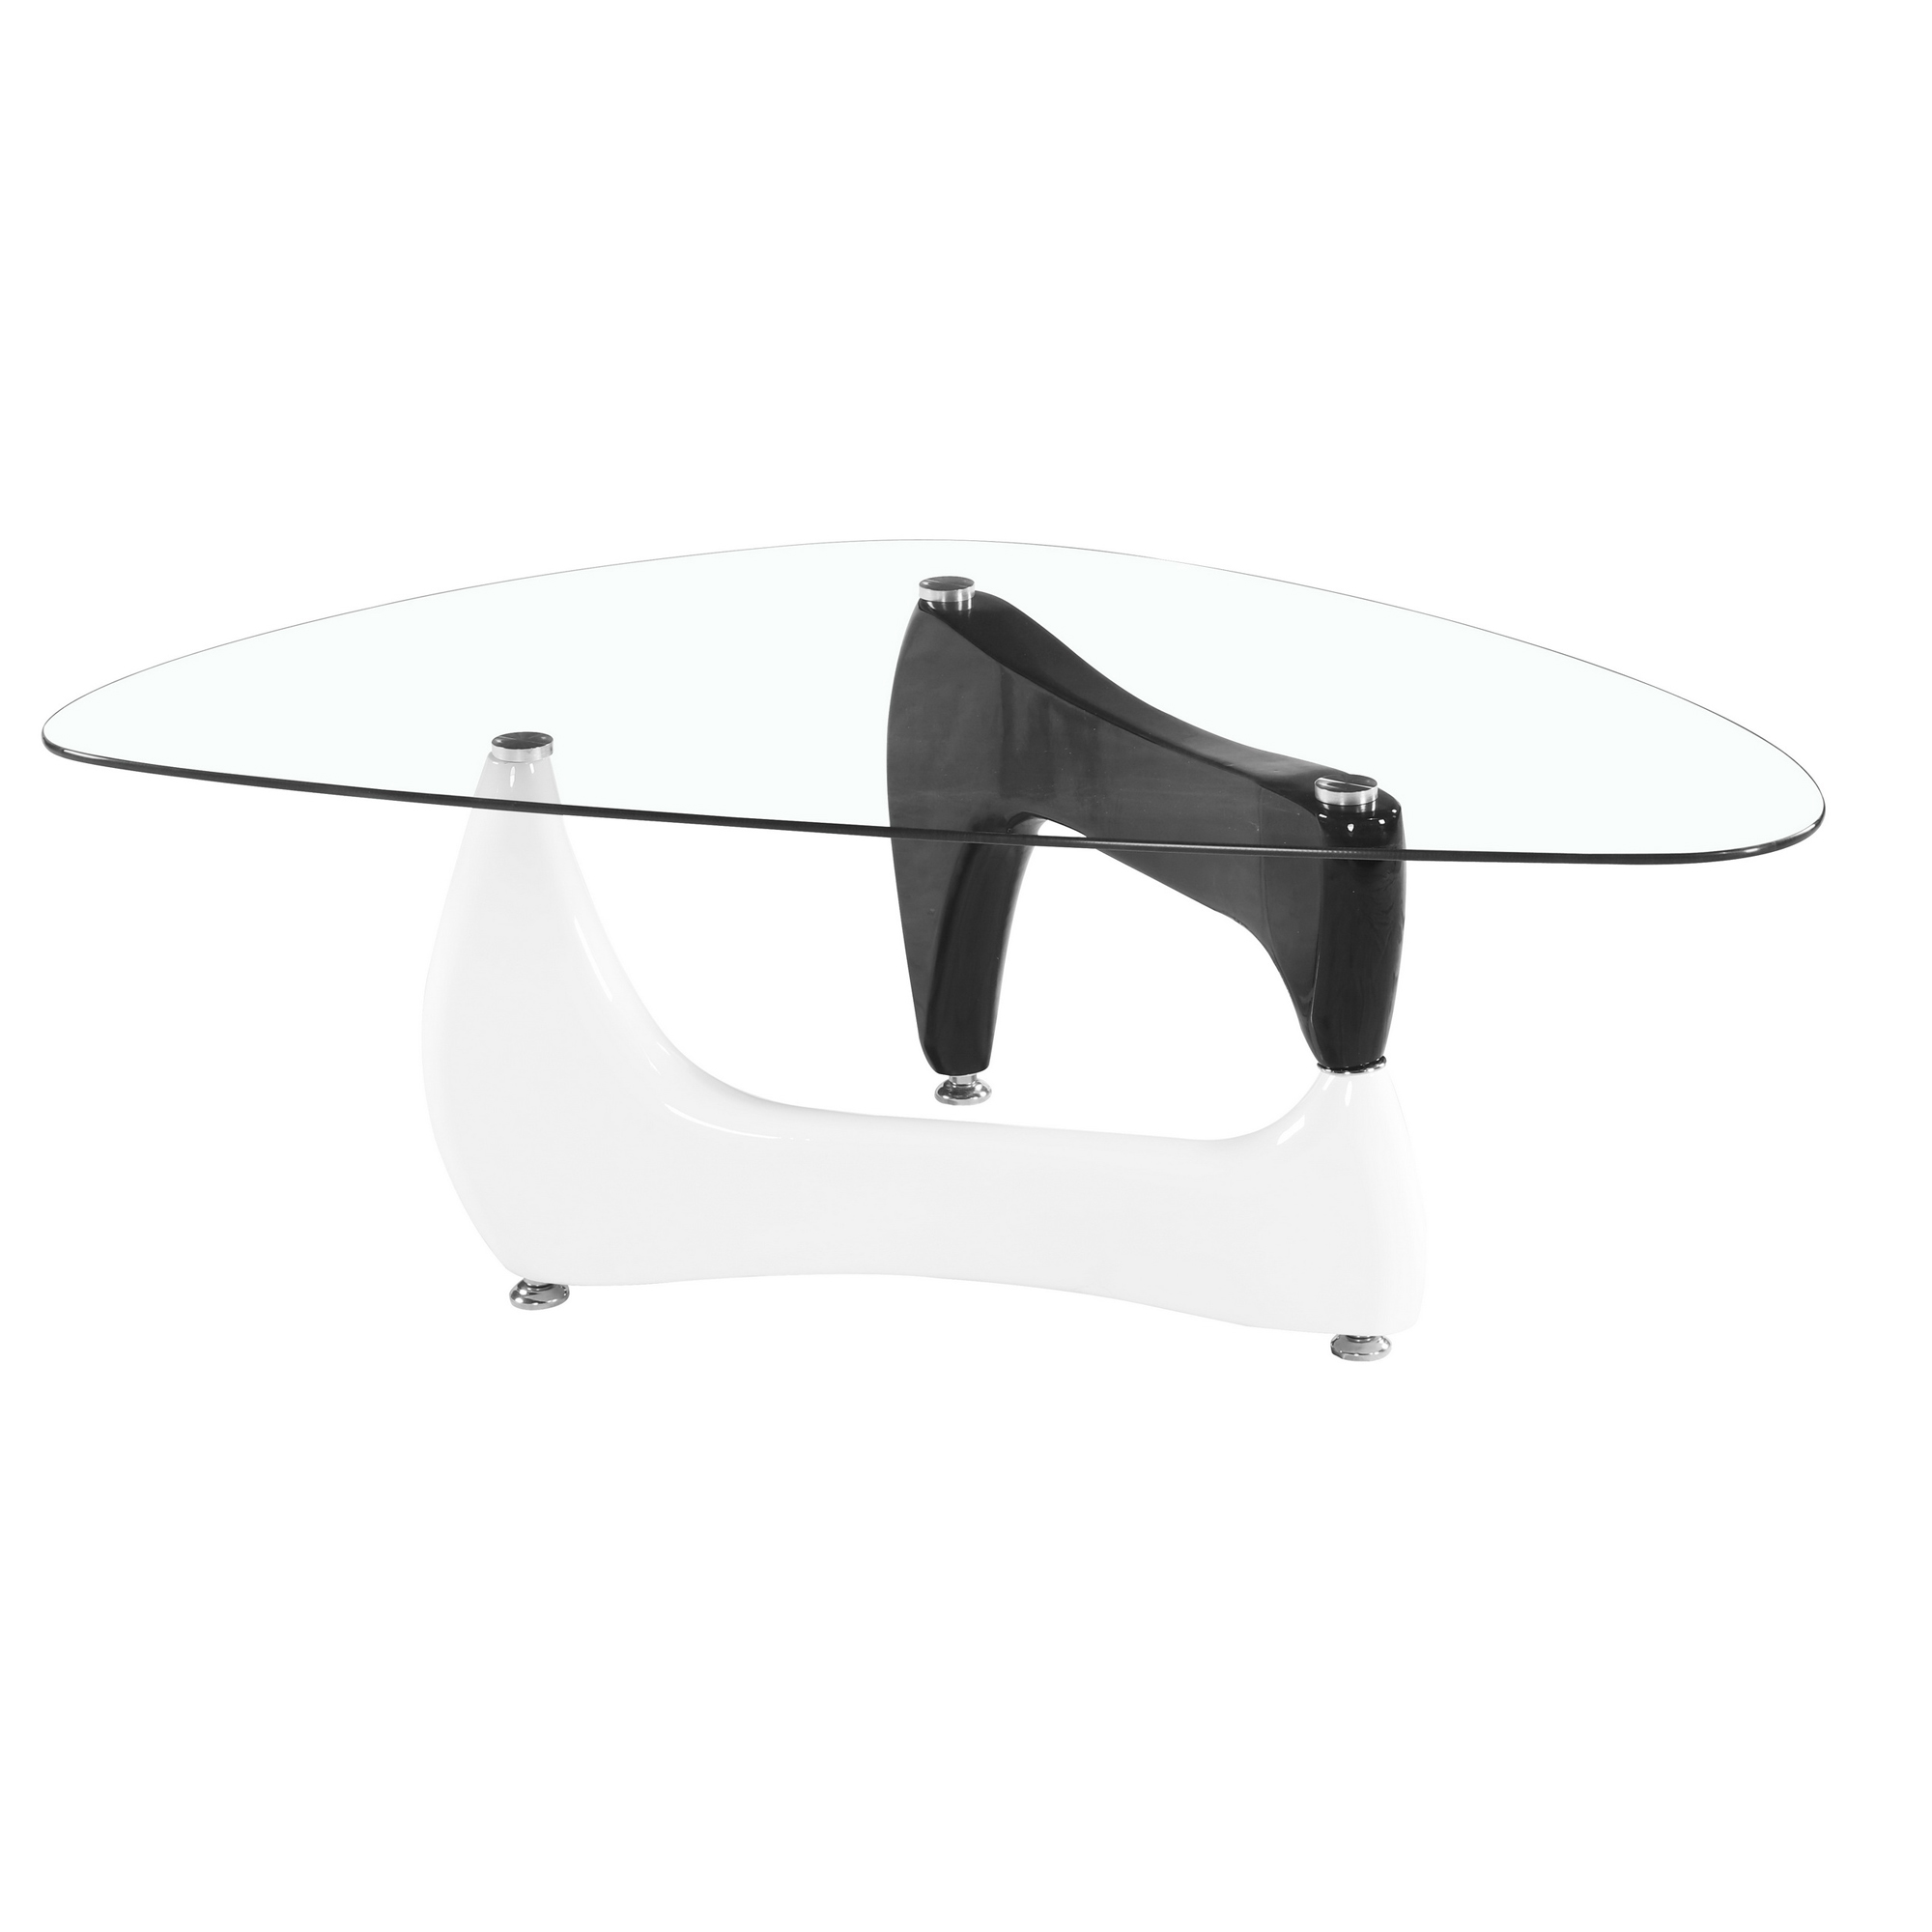 Noguchi Style Glass Coffee Table W Black White Gloss